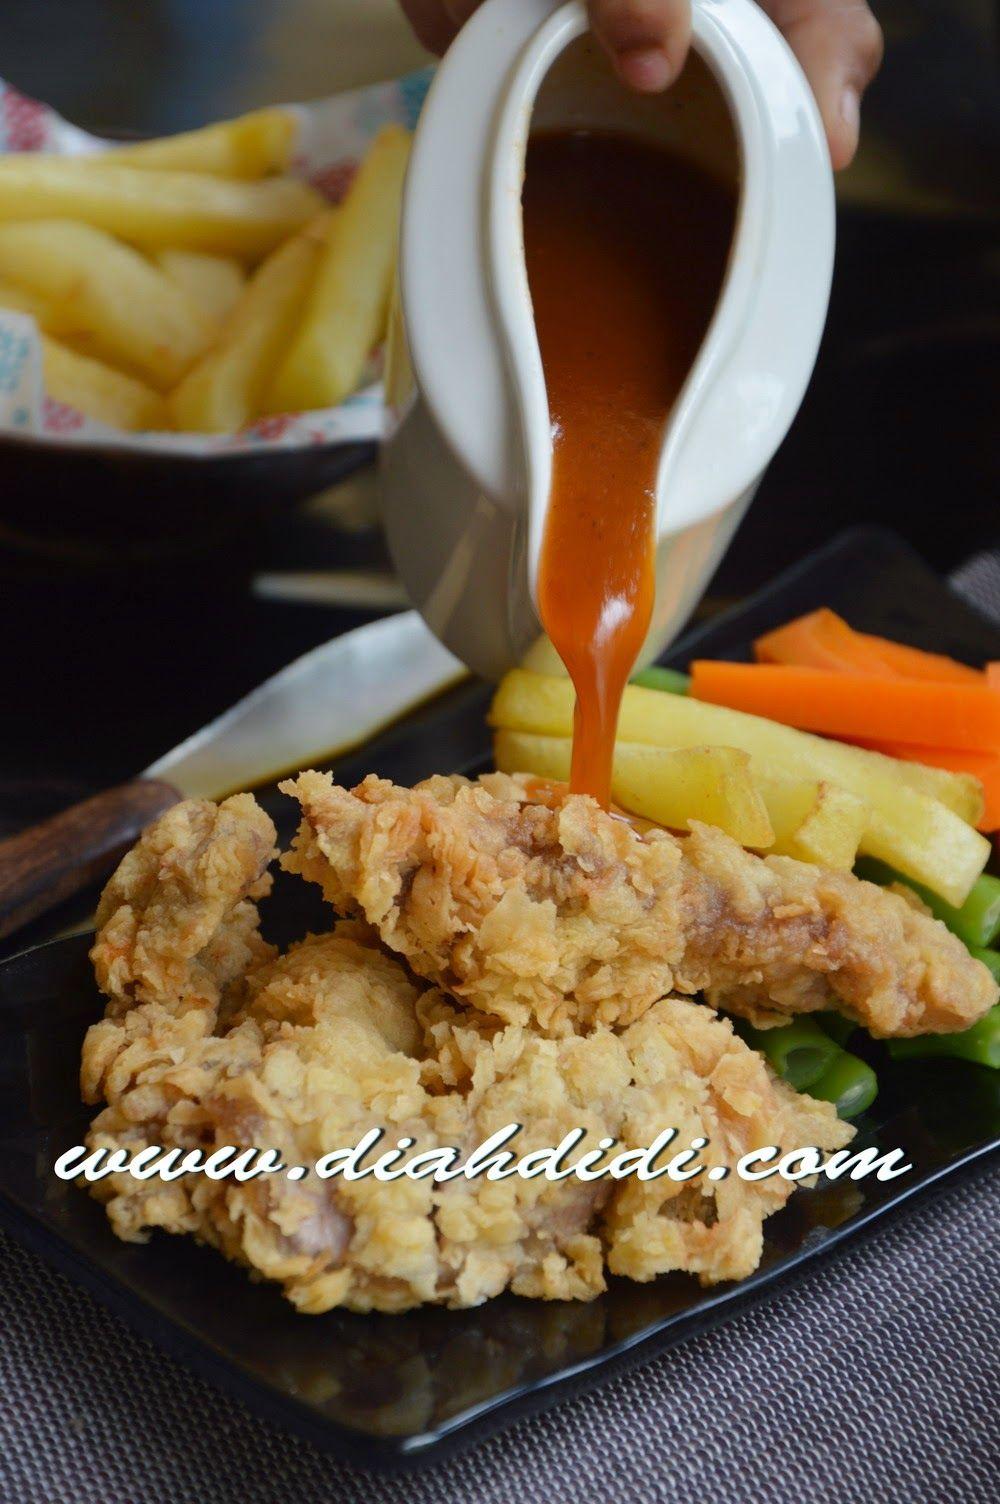 Sirloin Crispy Steak Resep Steak Resep Masakan Makanan Dan Minuman